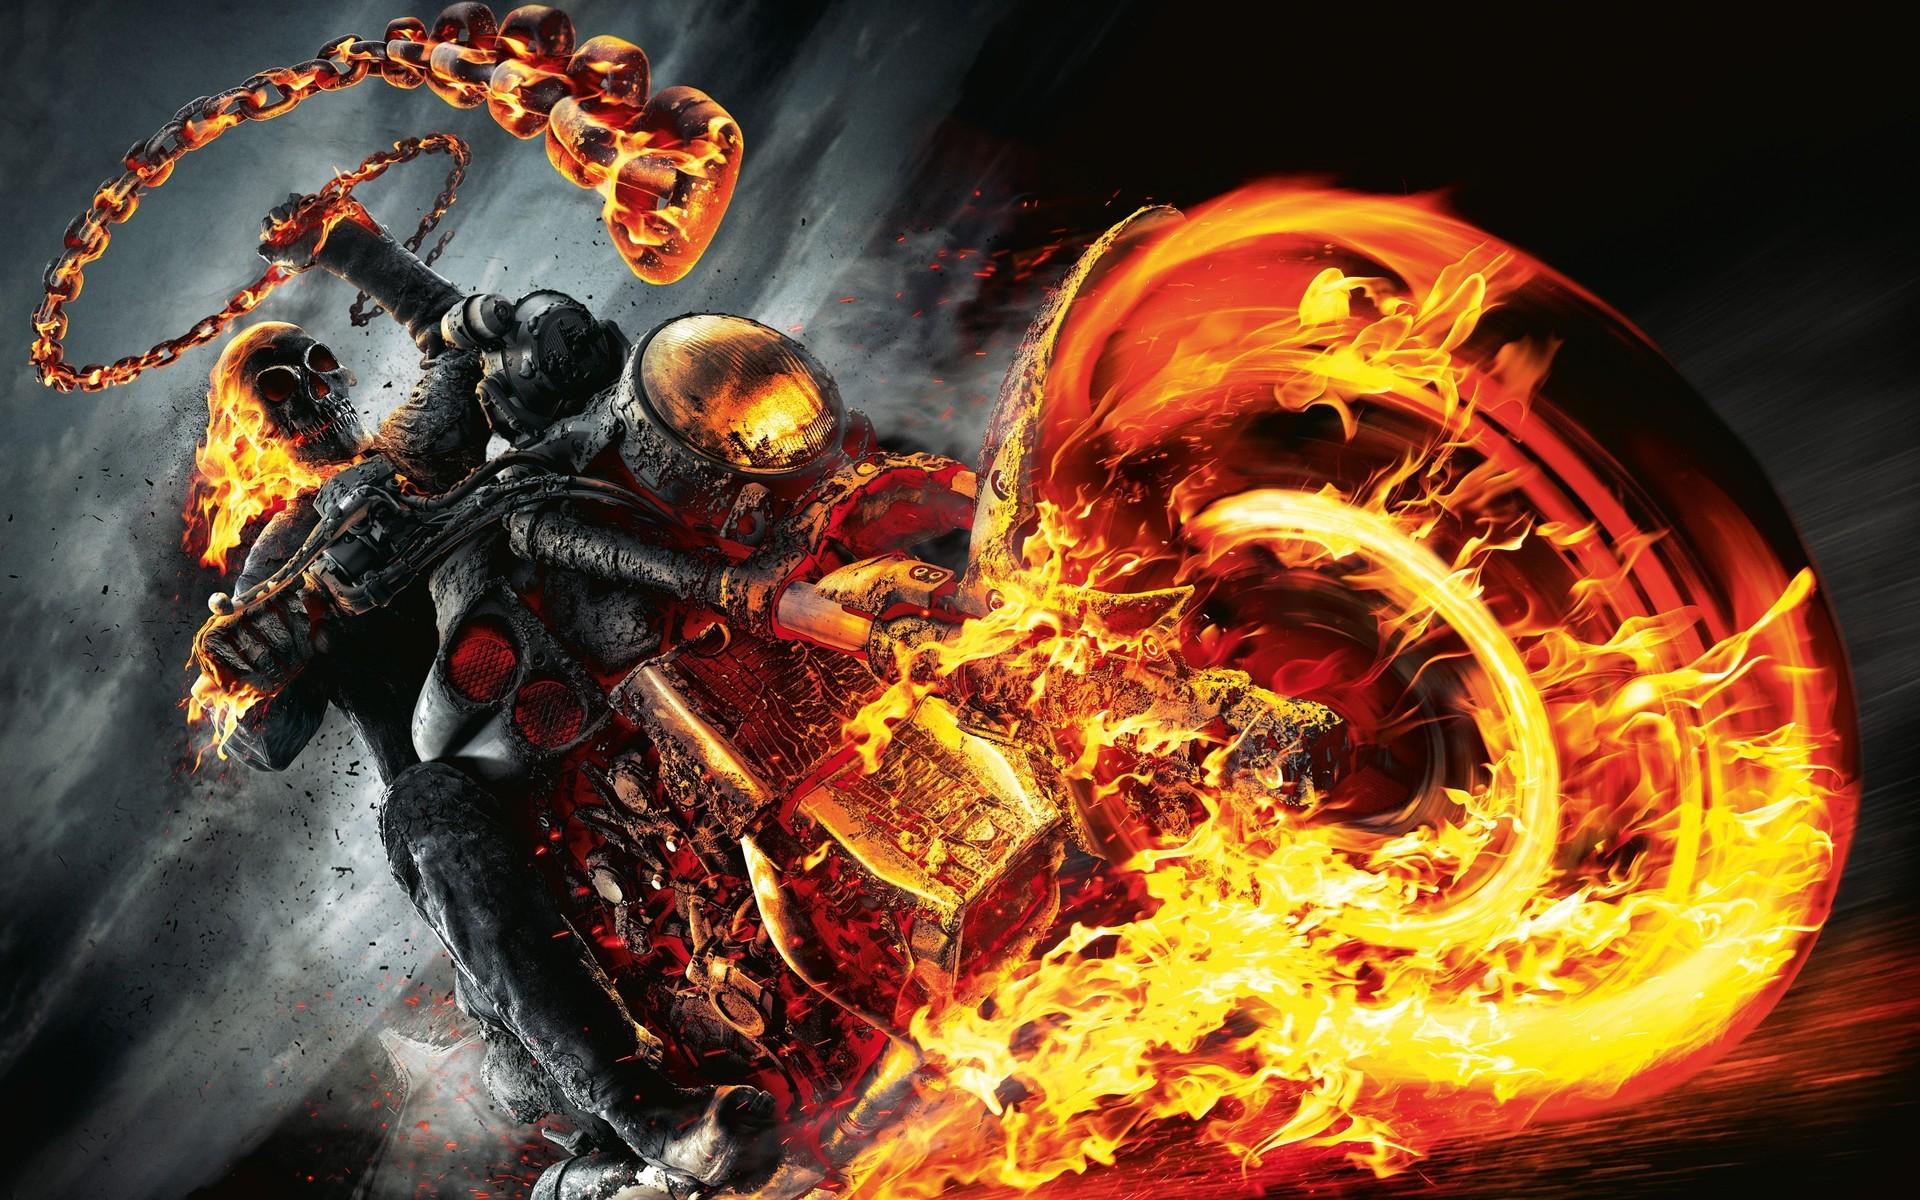 Flaming Skull Wallpaper 59 Images